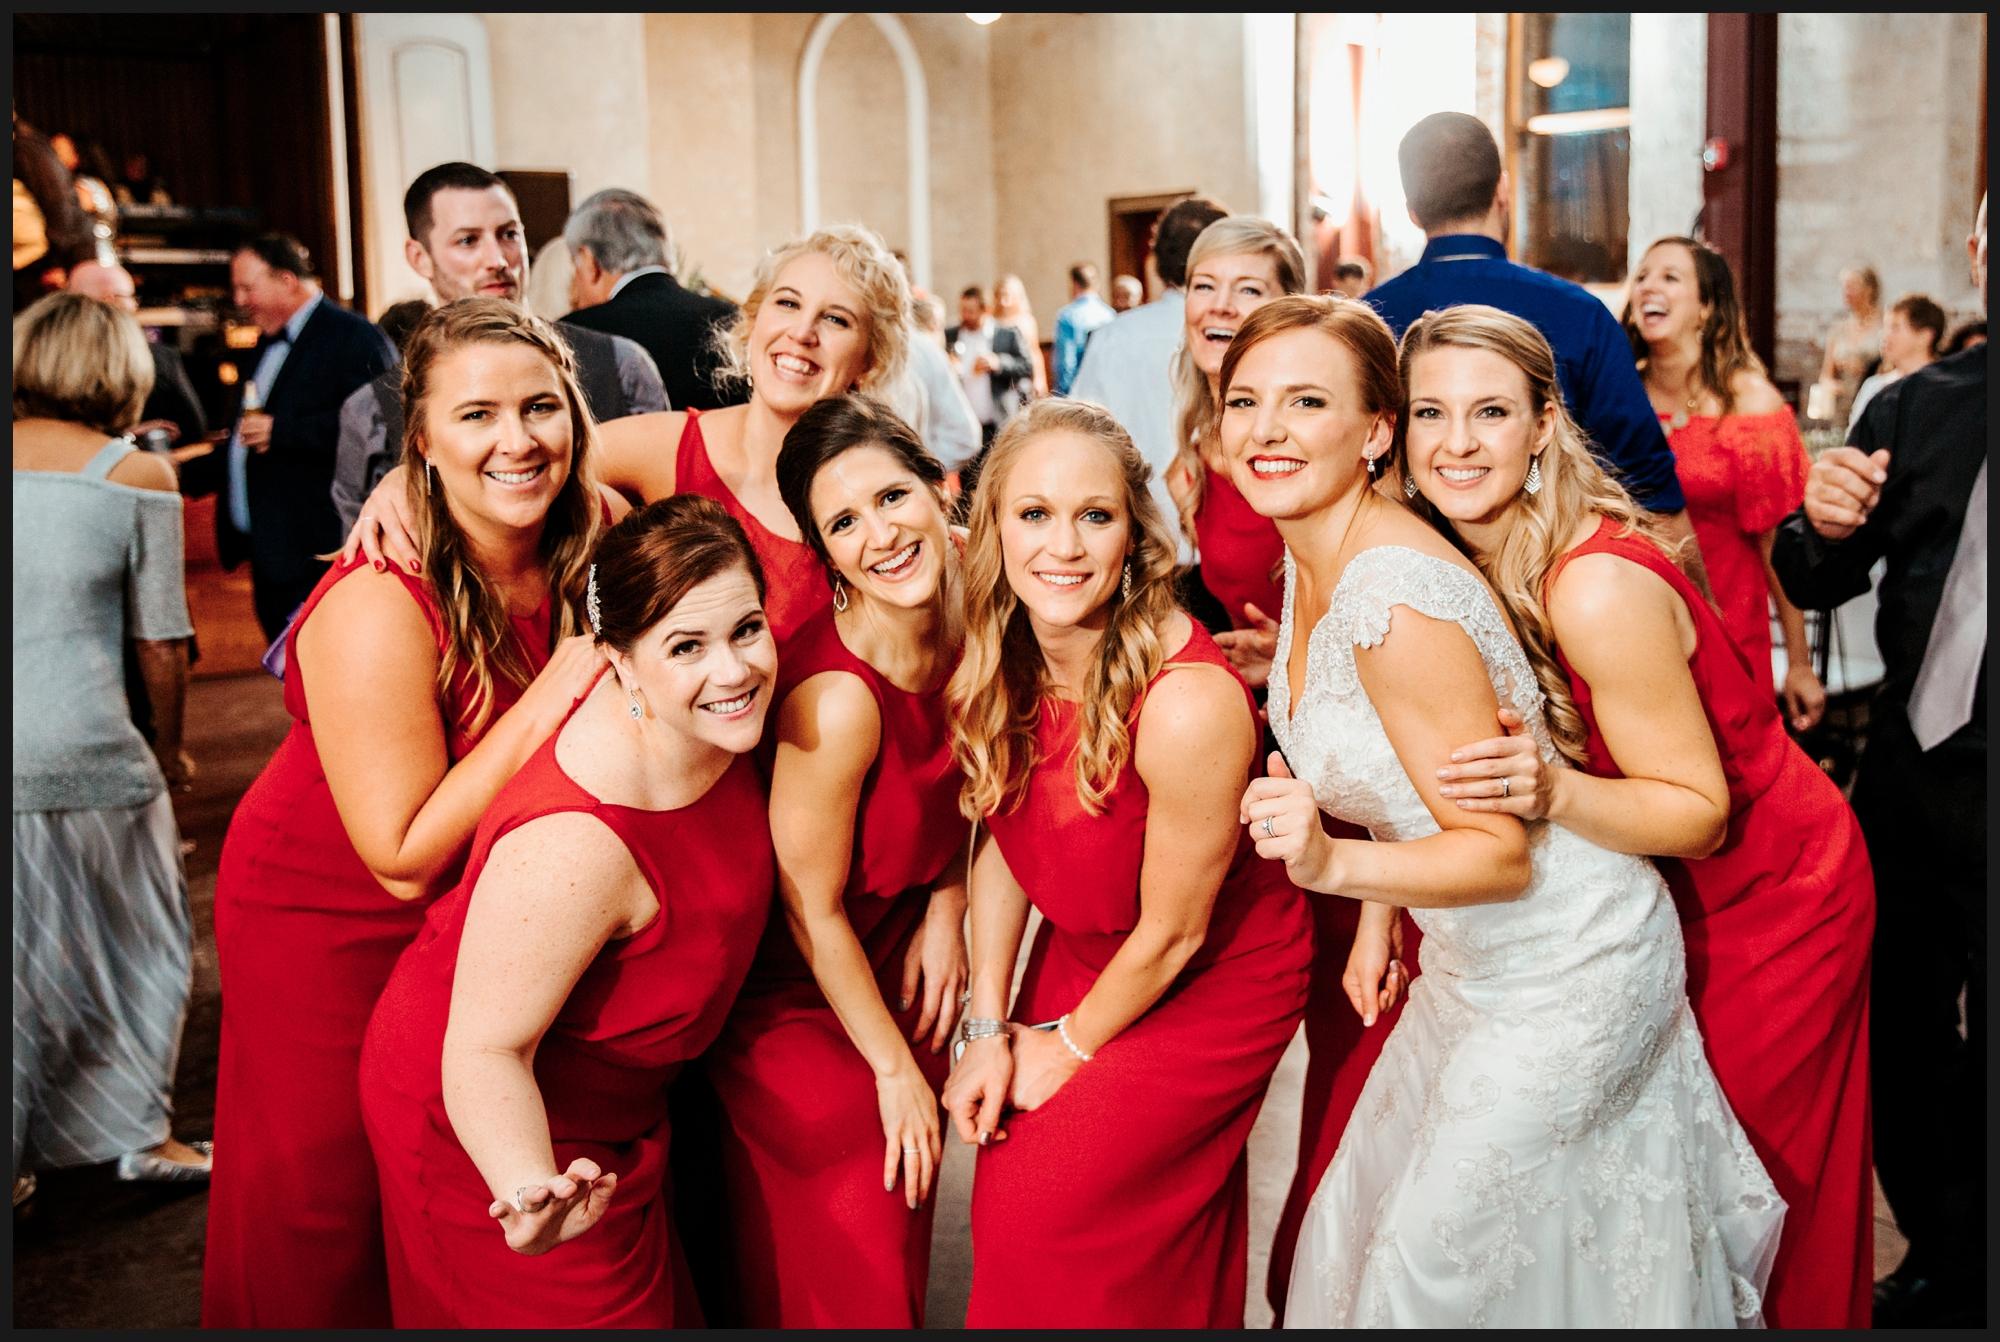 Orlando-Wedding-Photographer-destination-wedding-photographer-florida-wedding-photographer-bohemian-wedding-photographer_0661.jpg